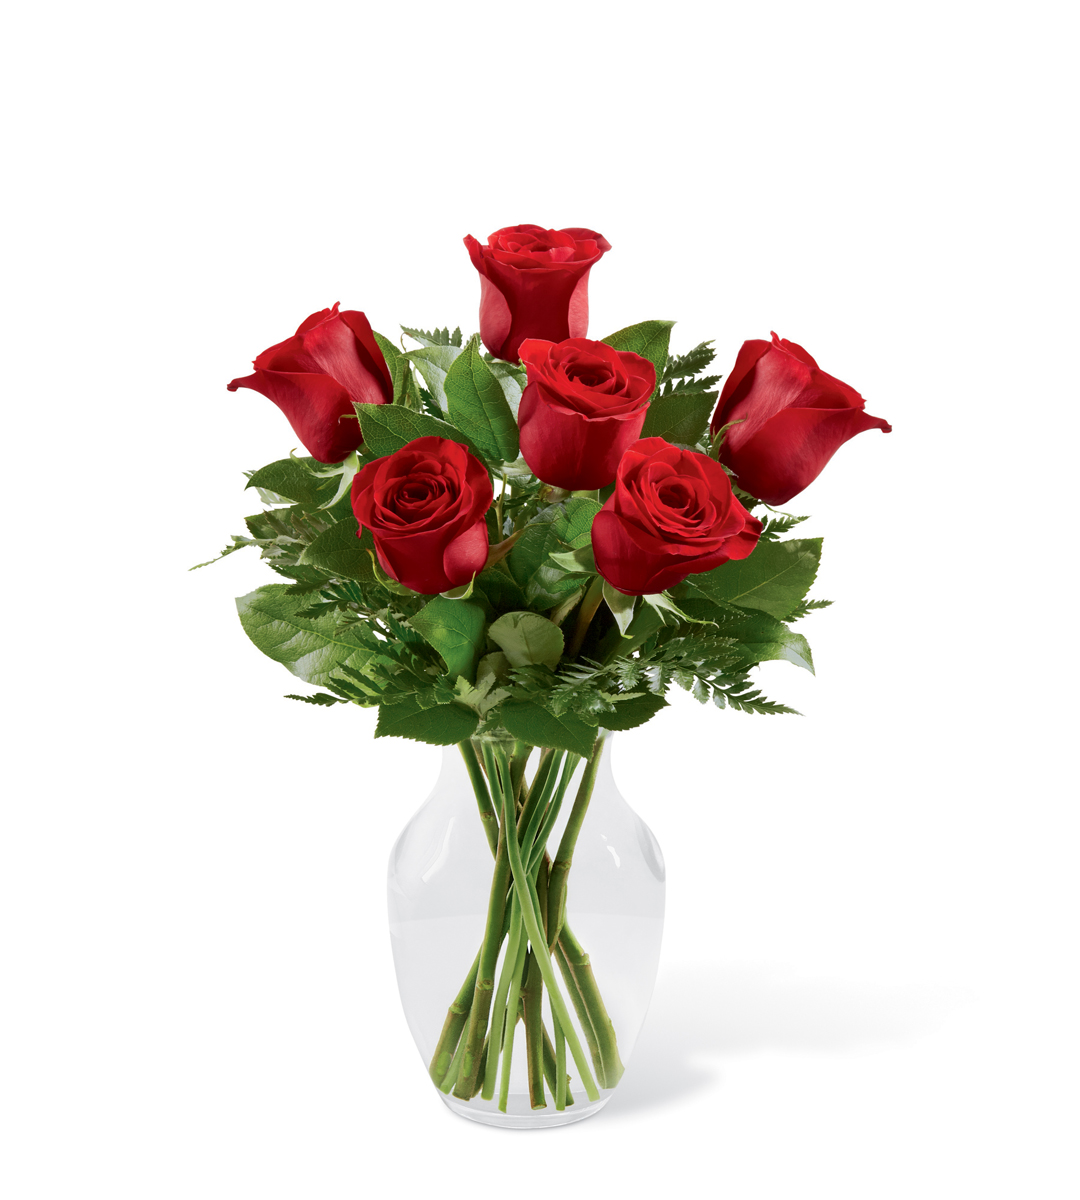 The Ftd Simply Enchanting Rose Bouquet Stroudsburg Pa Florist